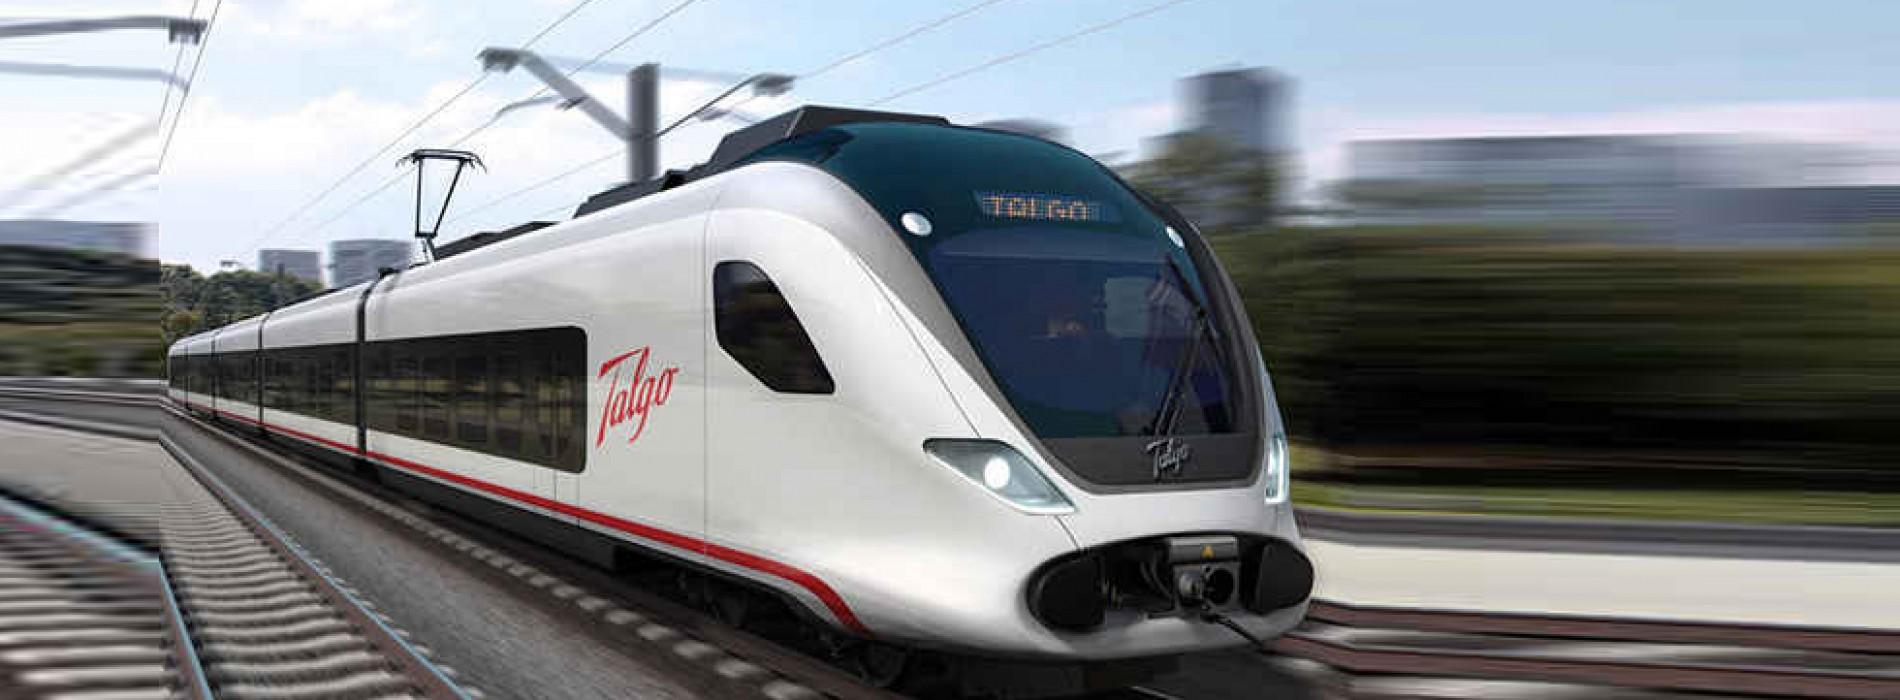 India speeds up Delhi-Mumbai rail plan